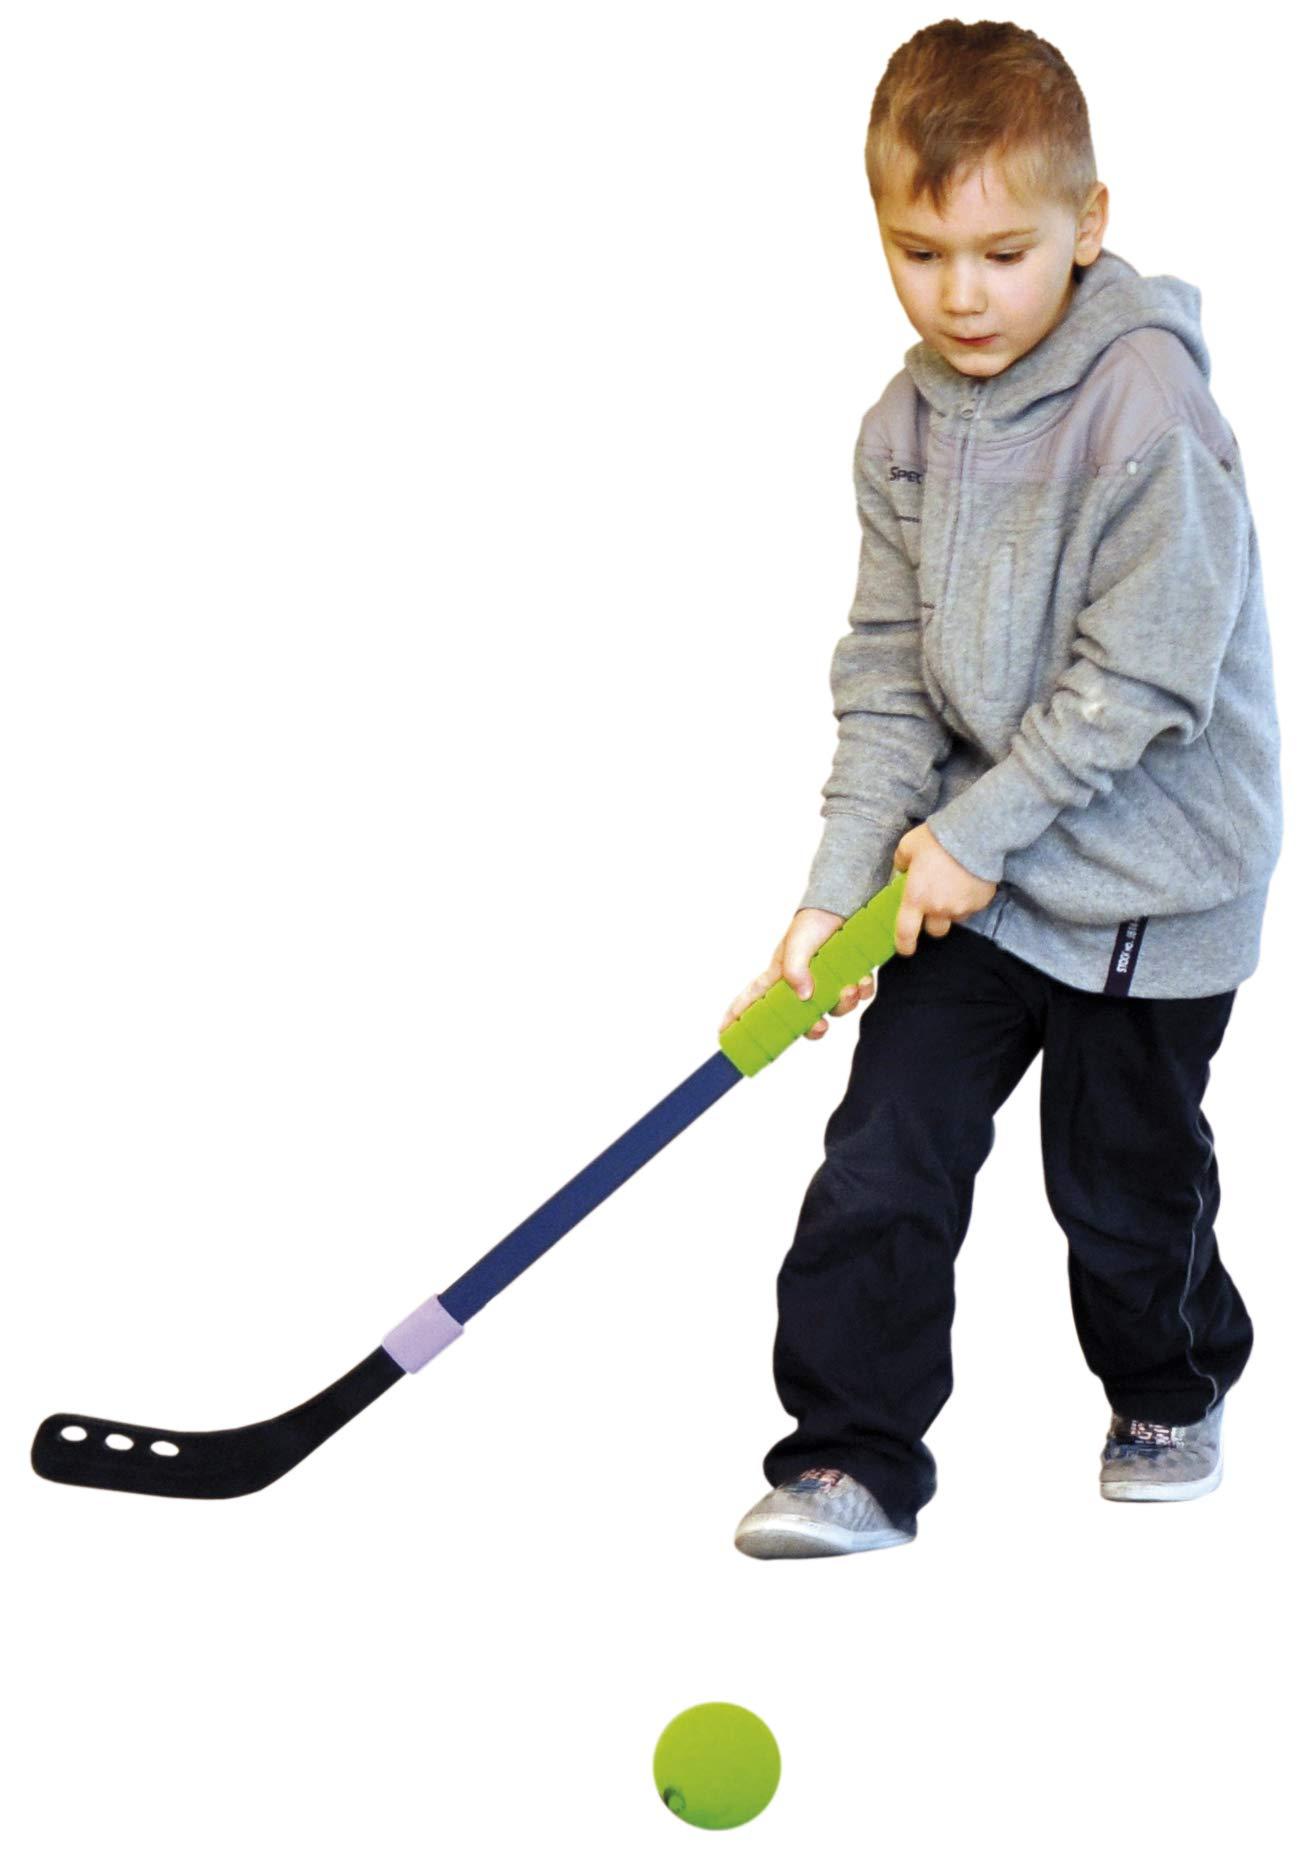 EDUPLAY 170181 50 cm Hockey (Assorted Color) by EDUPLAY